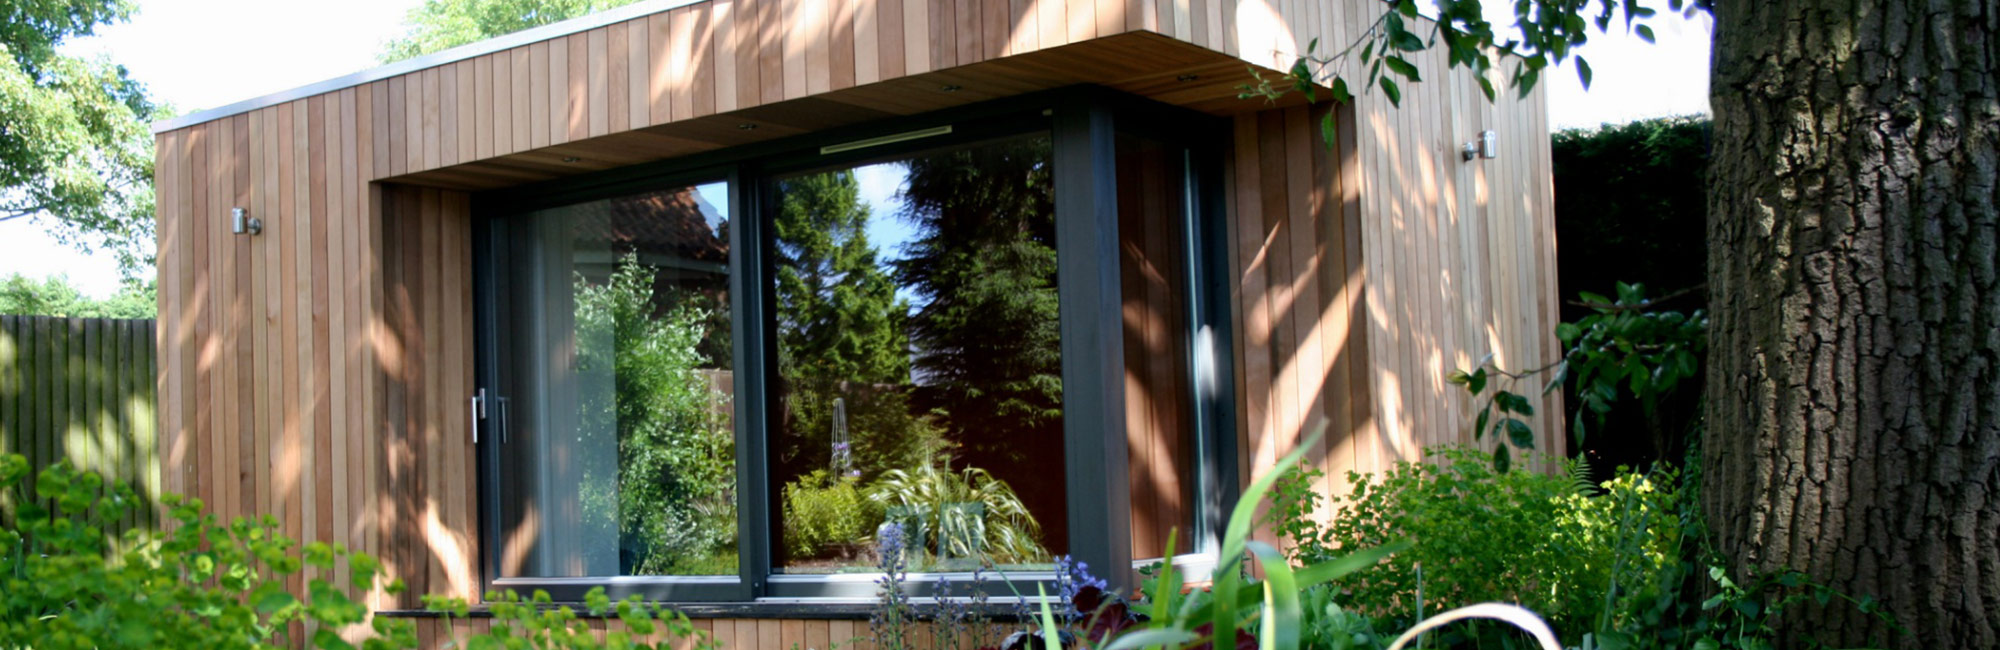 Timber Sliding Doors Park Farm Design